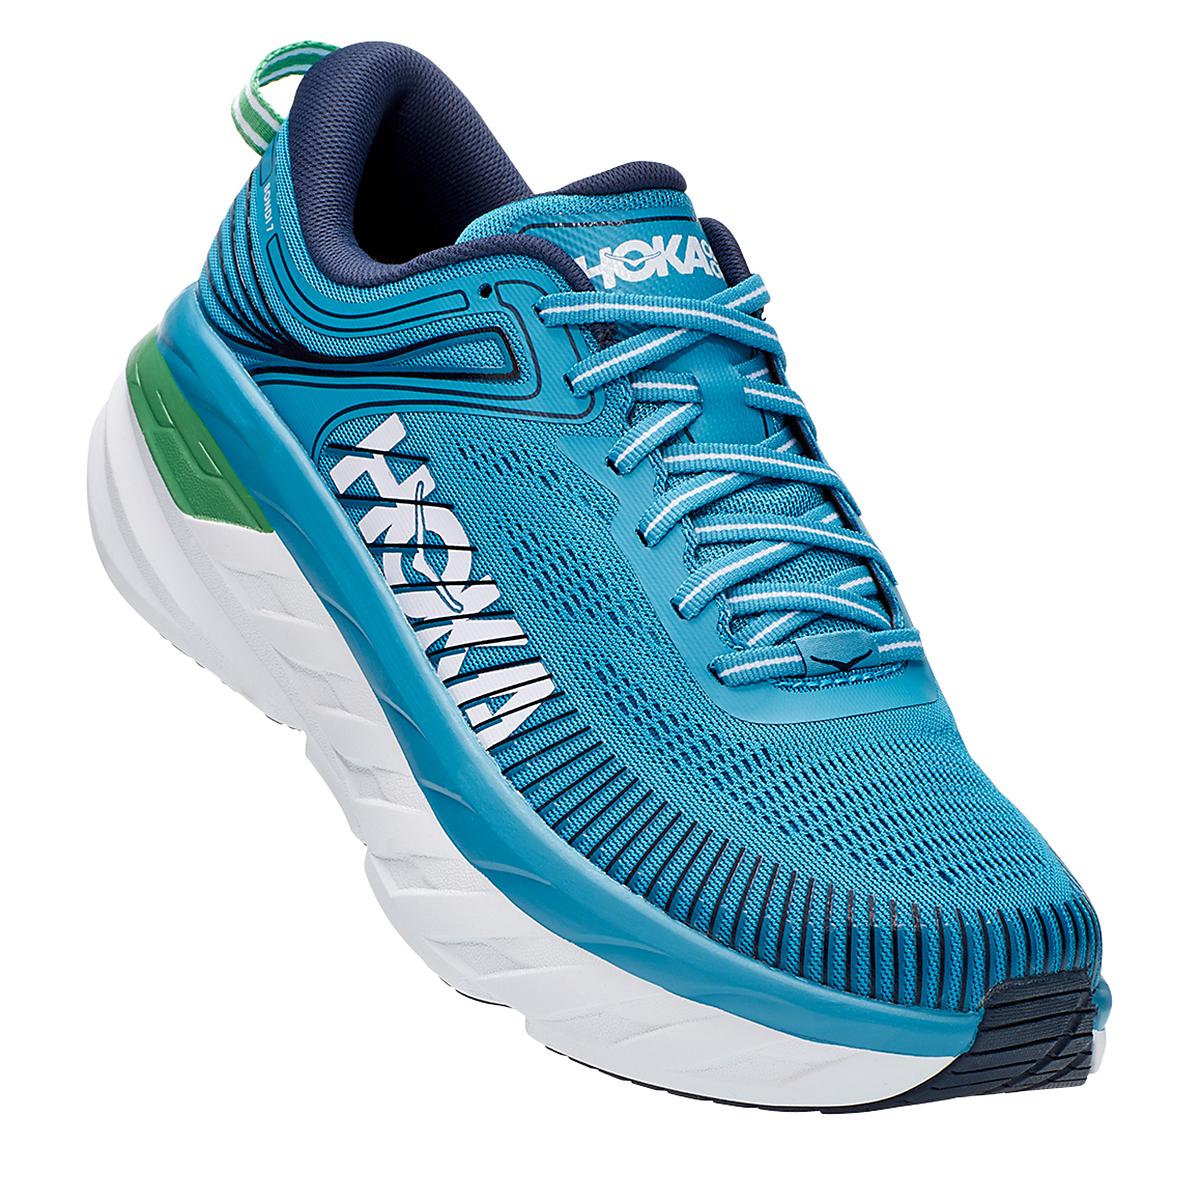 Men's Hoka One One Bondi 7 Running Shoe - Color: Blue Moon/Moonlit Ocean - Size: 7 - Width: Regular, Blue Moon/Moonlit Ocean, large, image 3